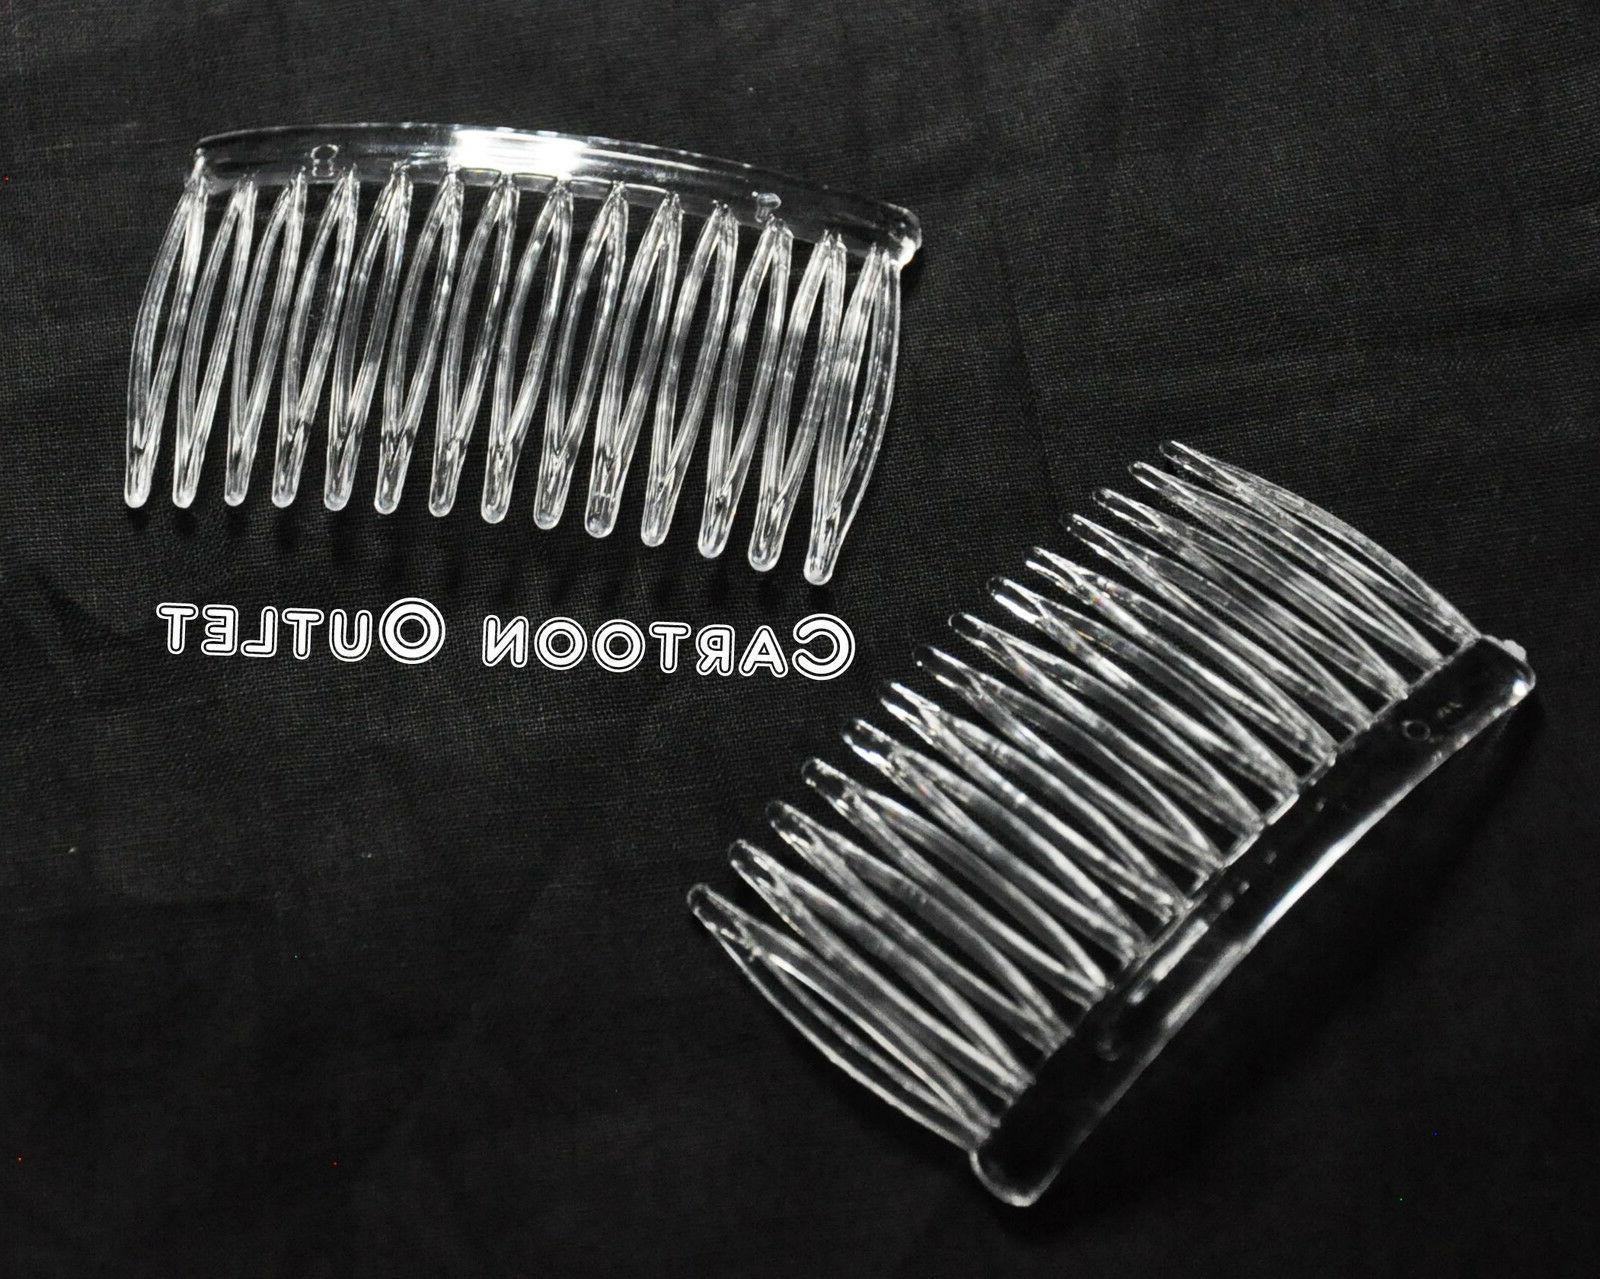 6 clear plastic plain hair clips combs